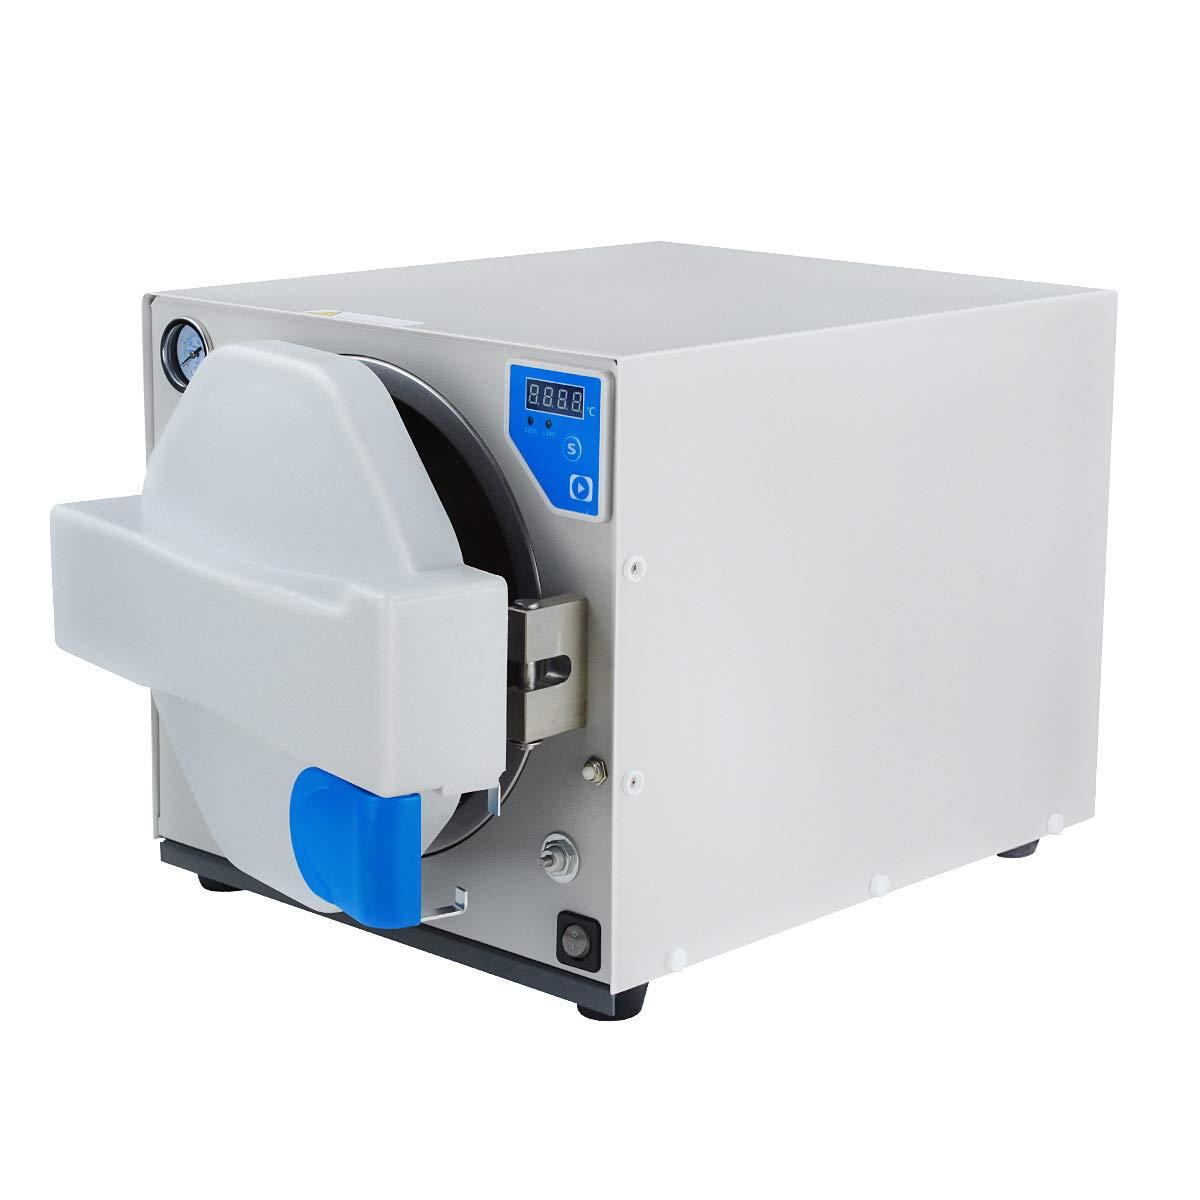 SOHOME 18L MINI320 Digital Display Autoclave Steam Lab Machine by SoHome (Image #4)